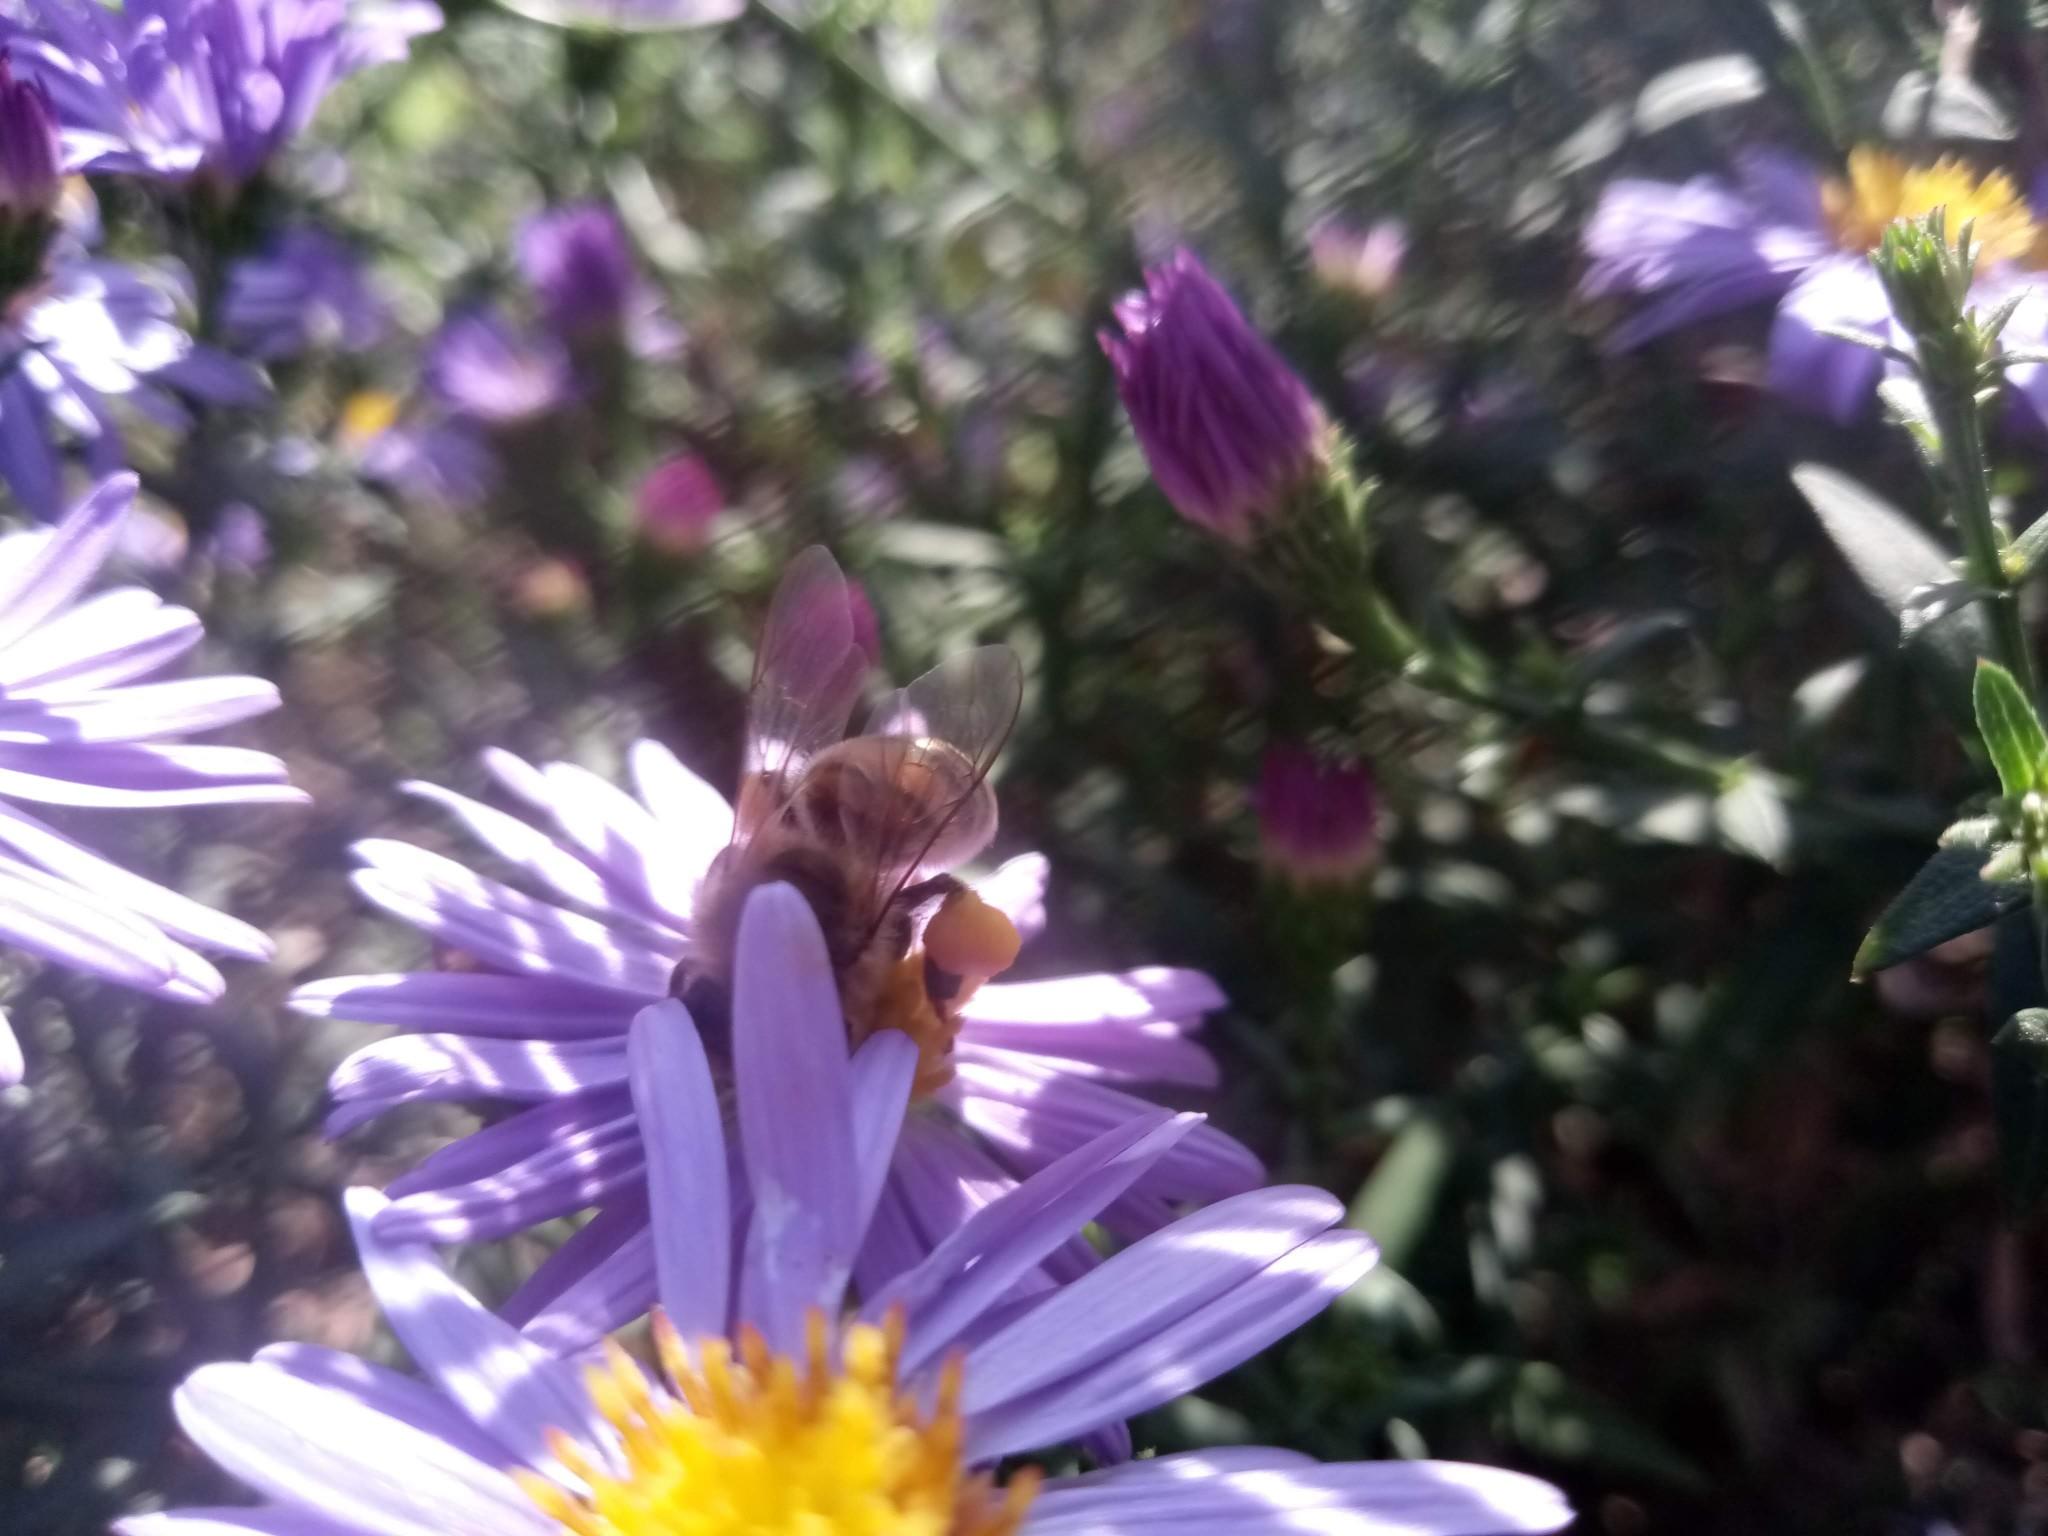 Bee on flowers photo